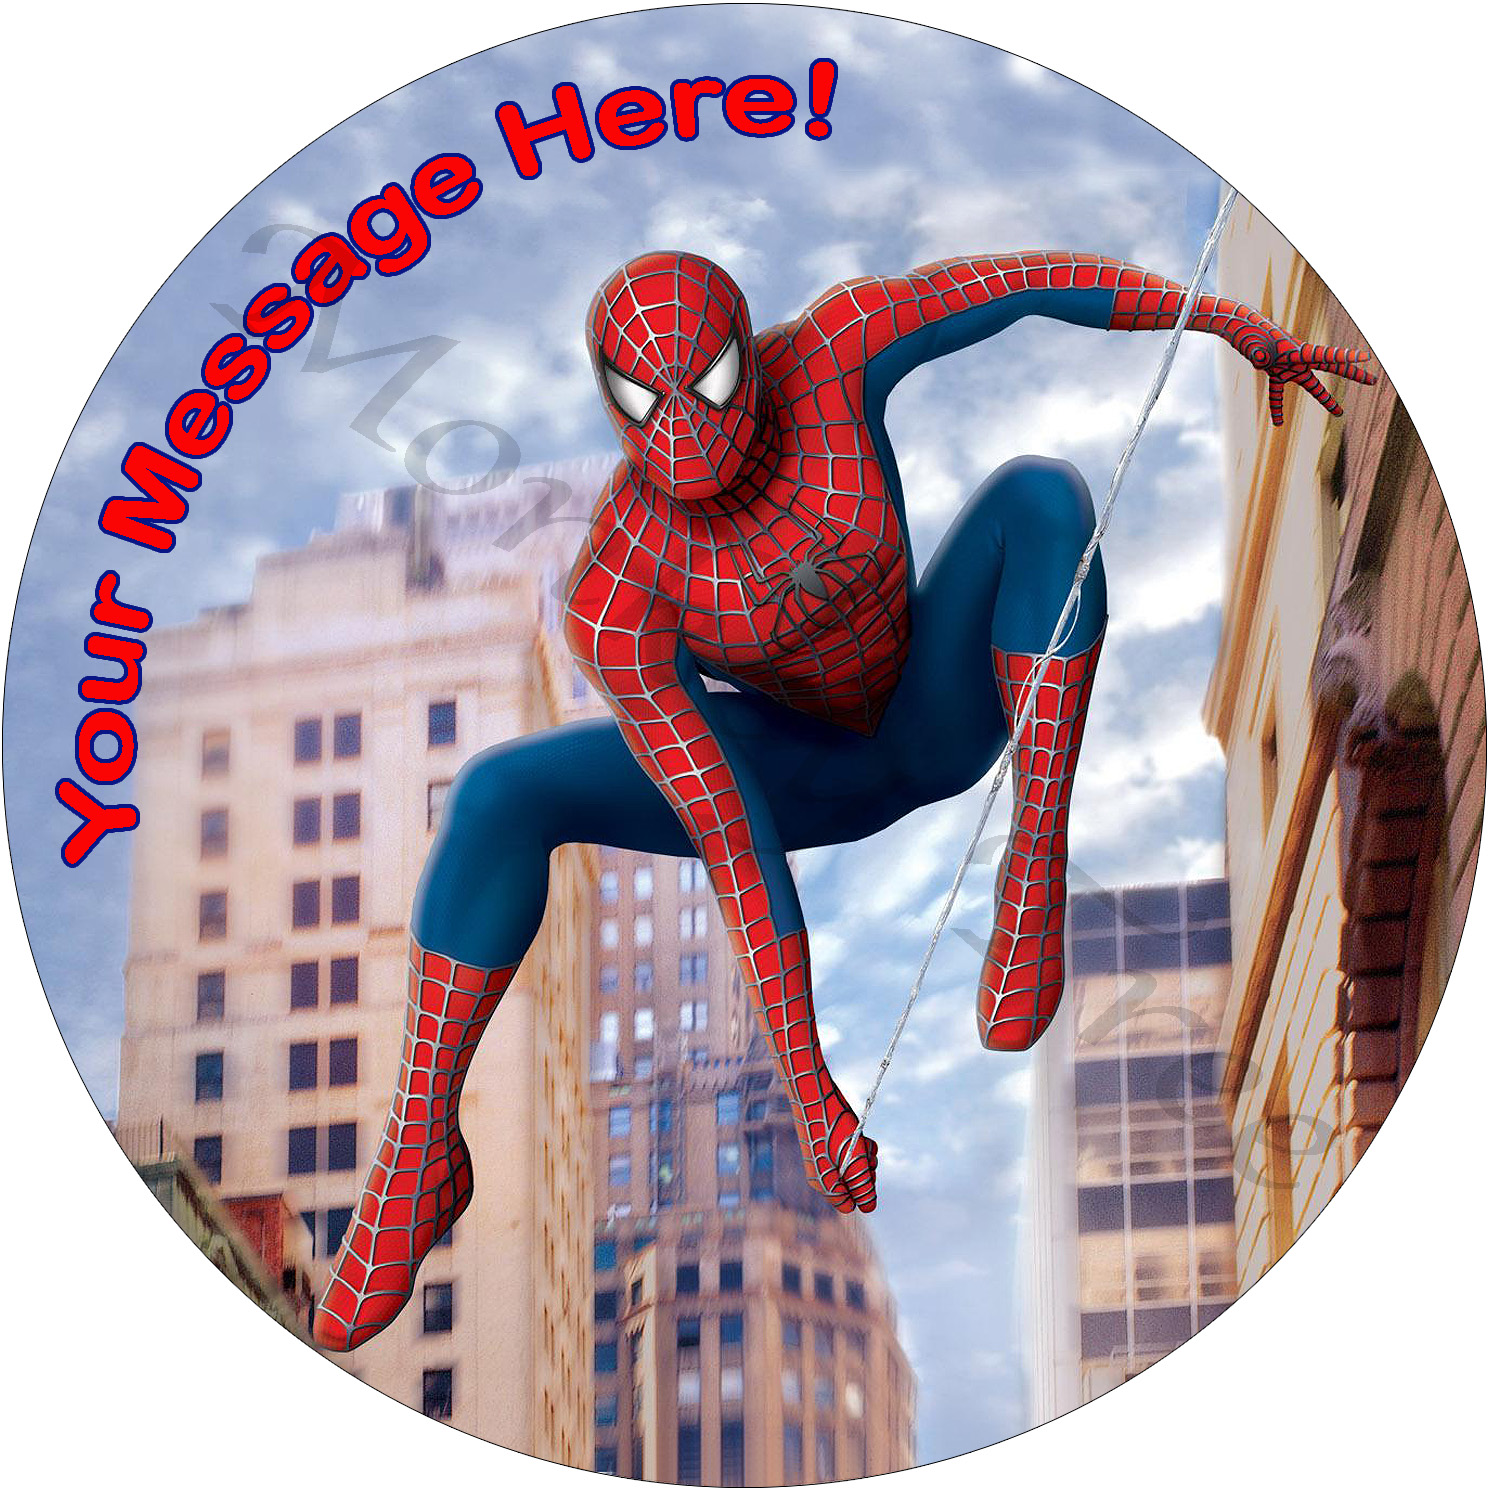 spiderman edible cake fondant icing image party superhero